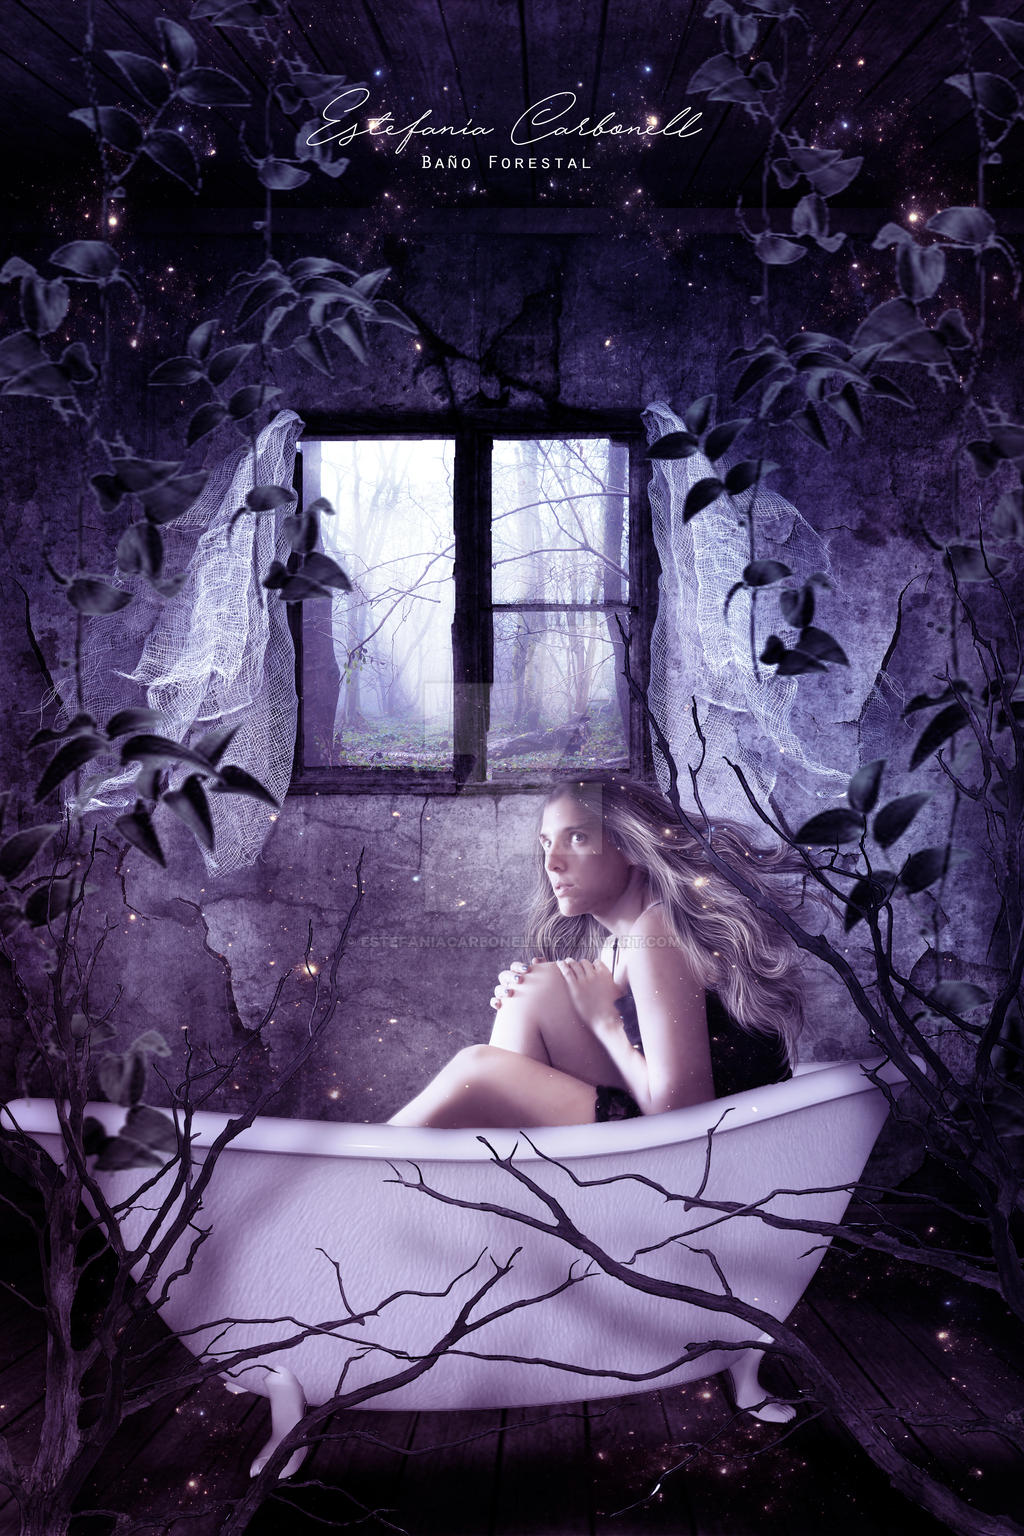 362 - Banyo Forestal